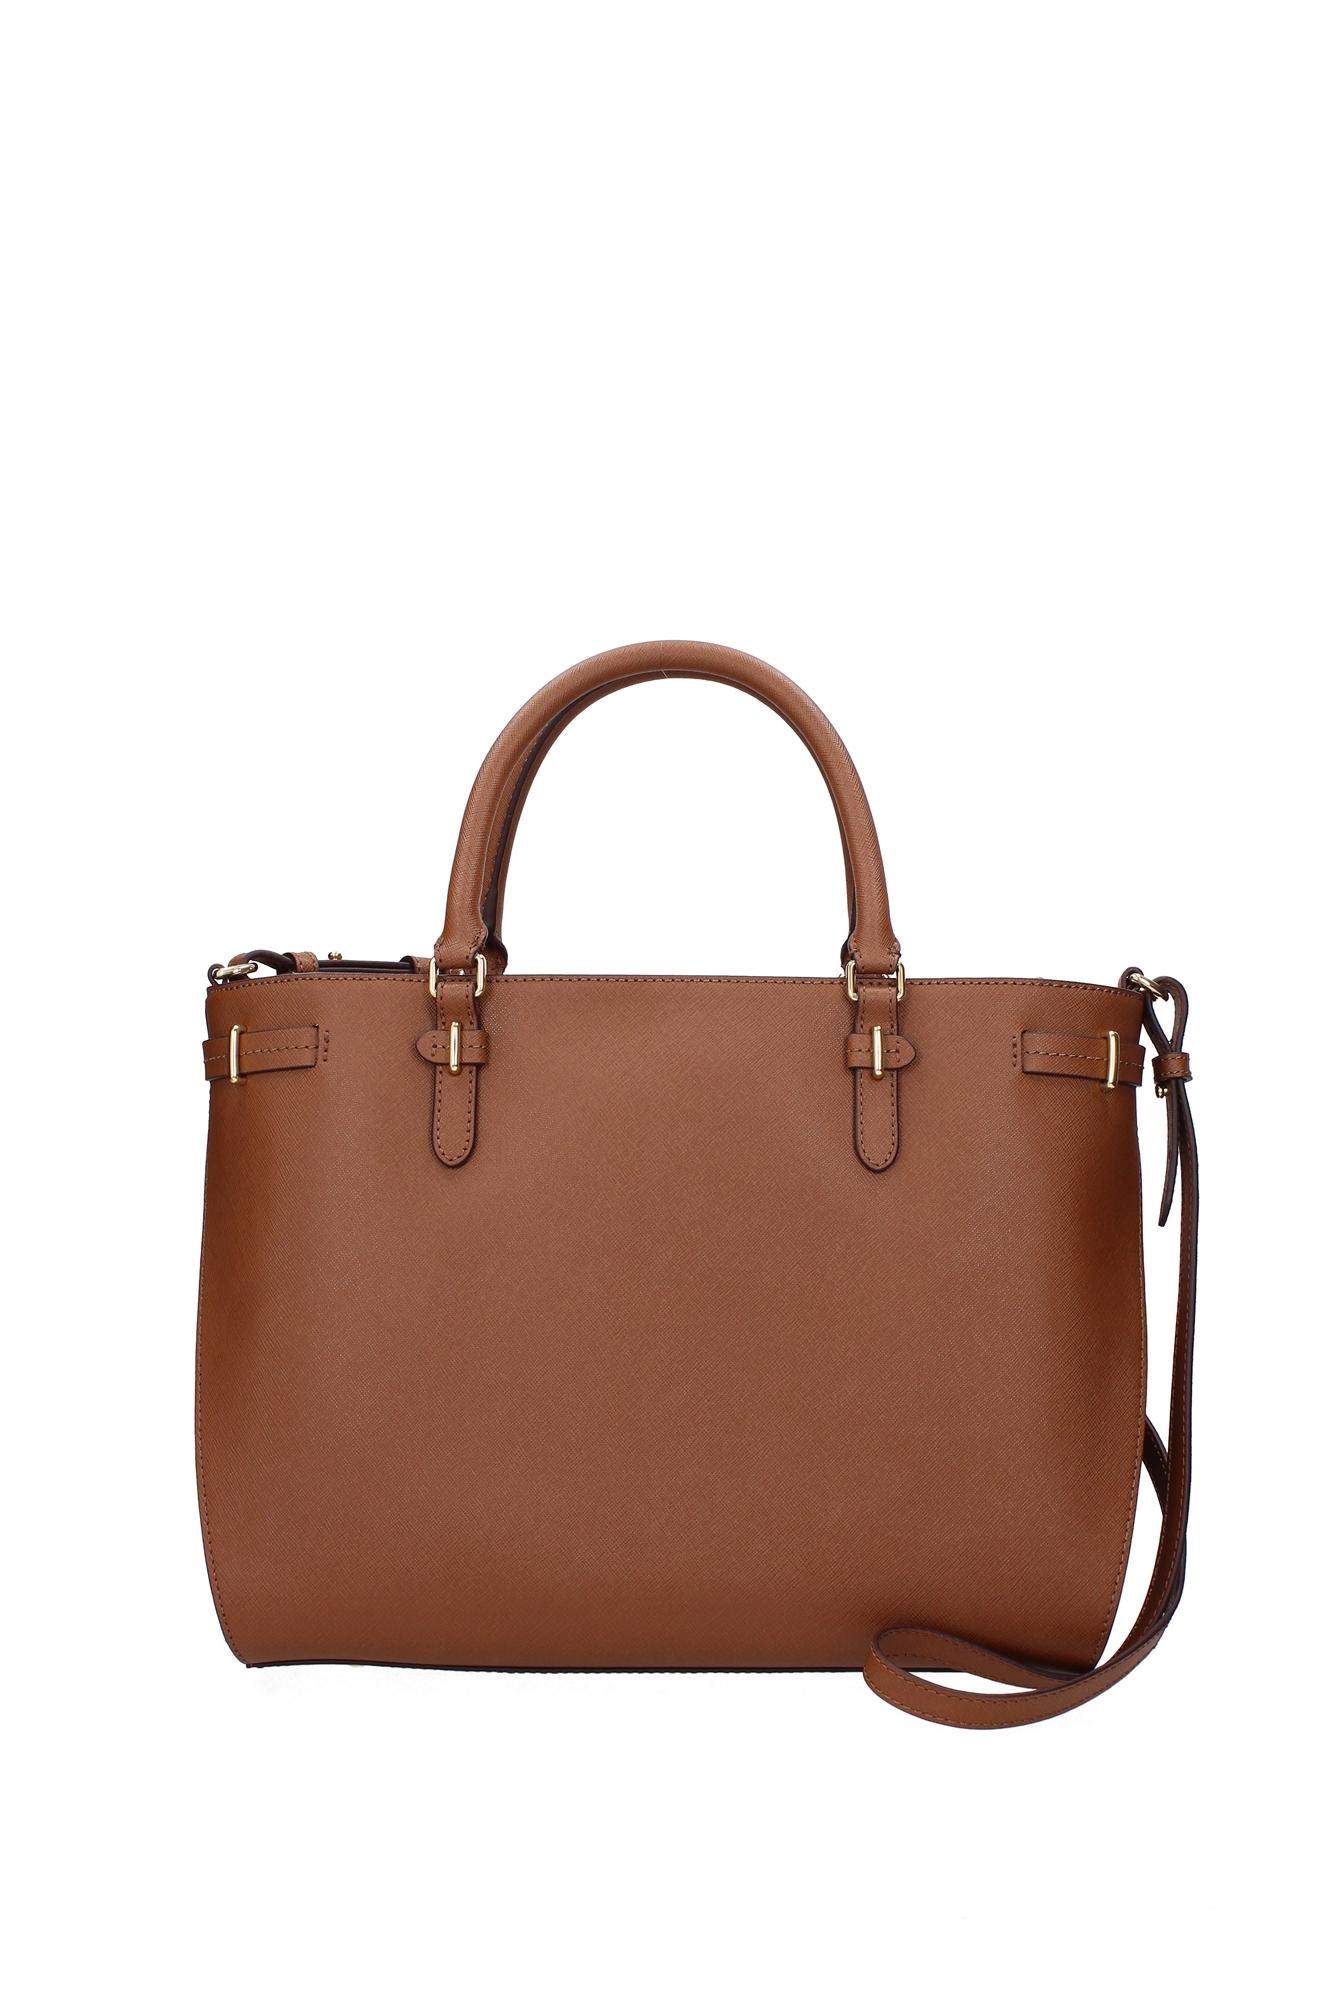 Awesome Beauty Shadow Ralph Lauren Handbags For Women